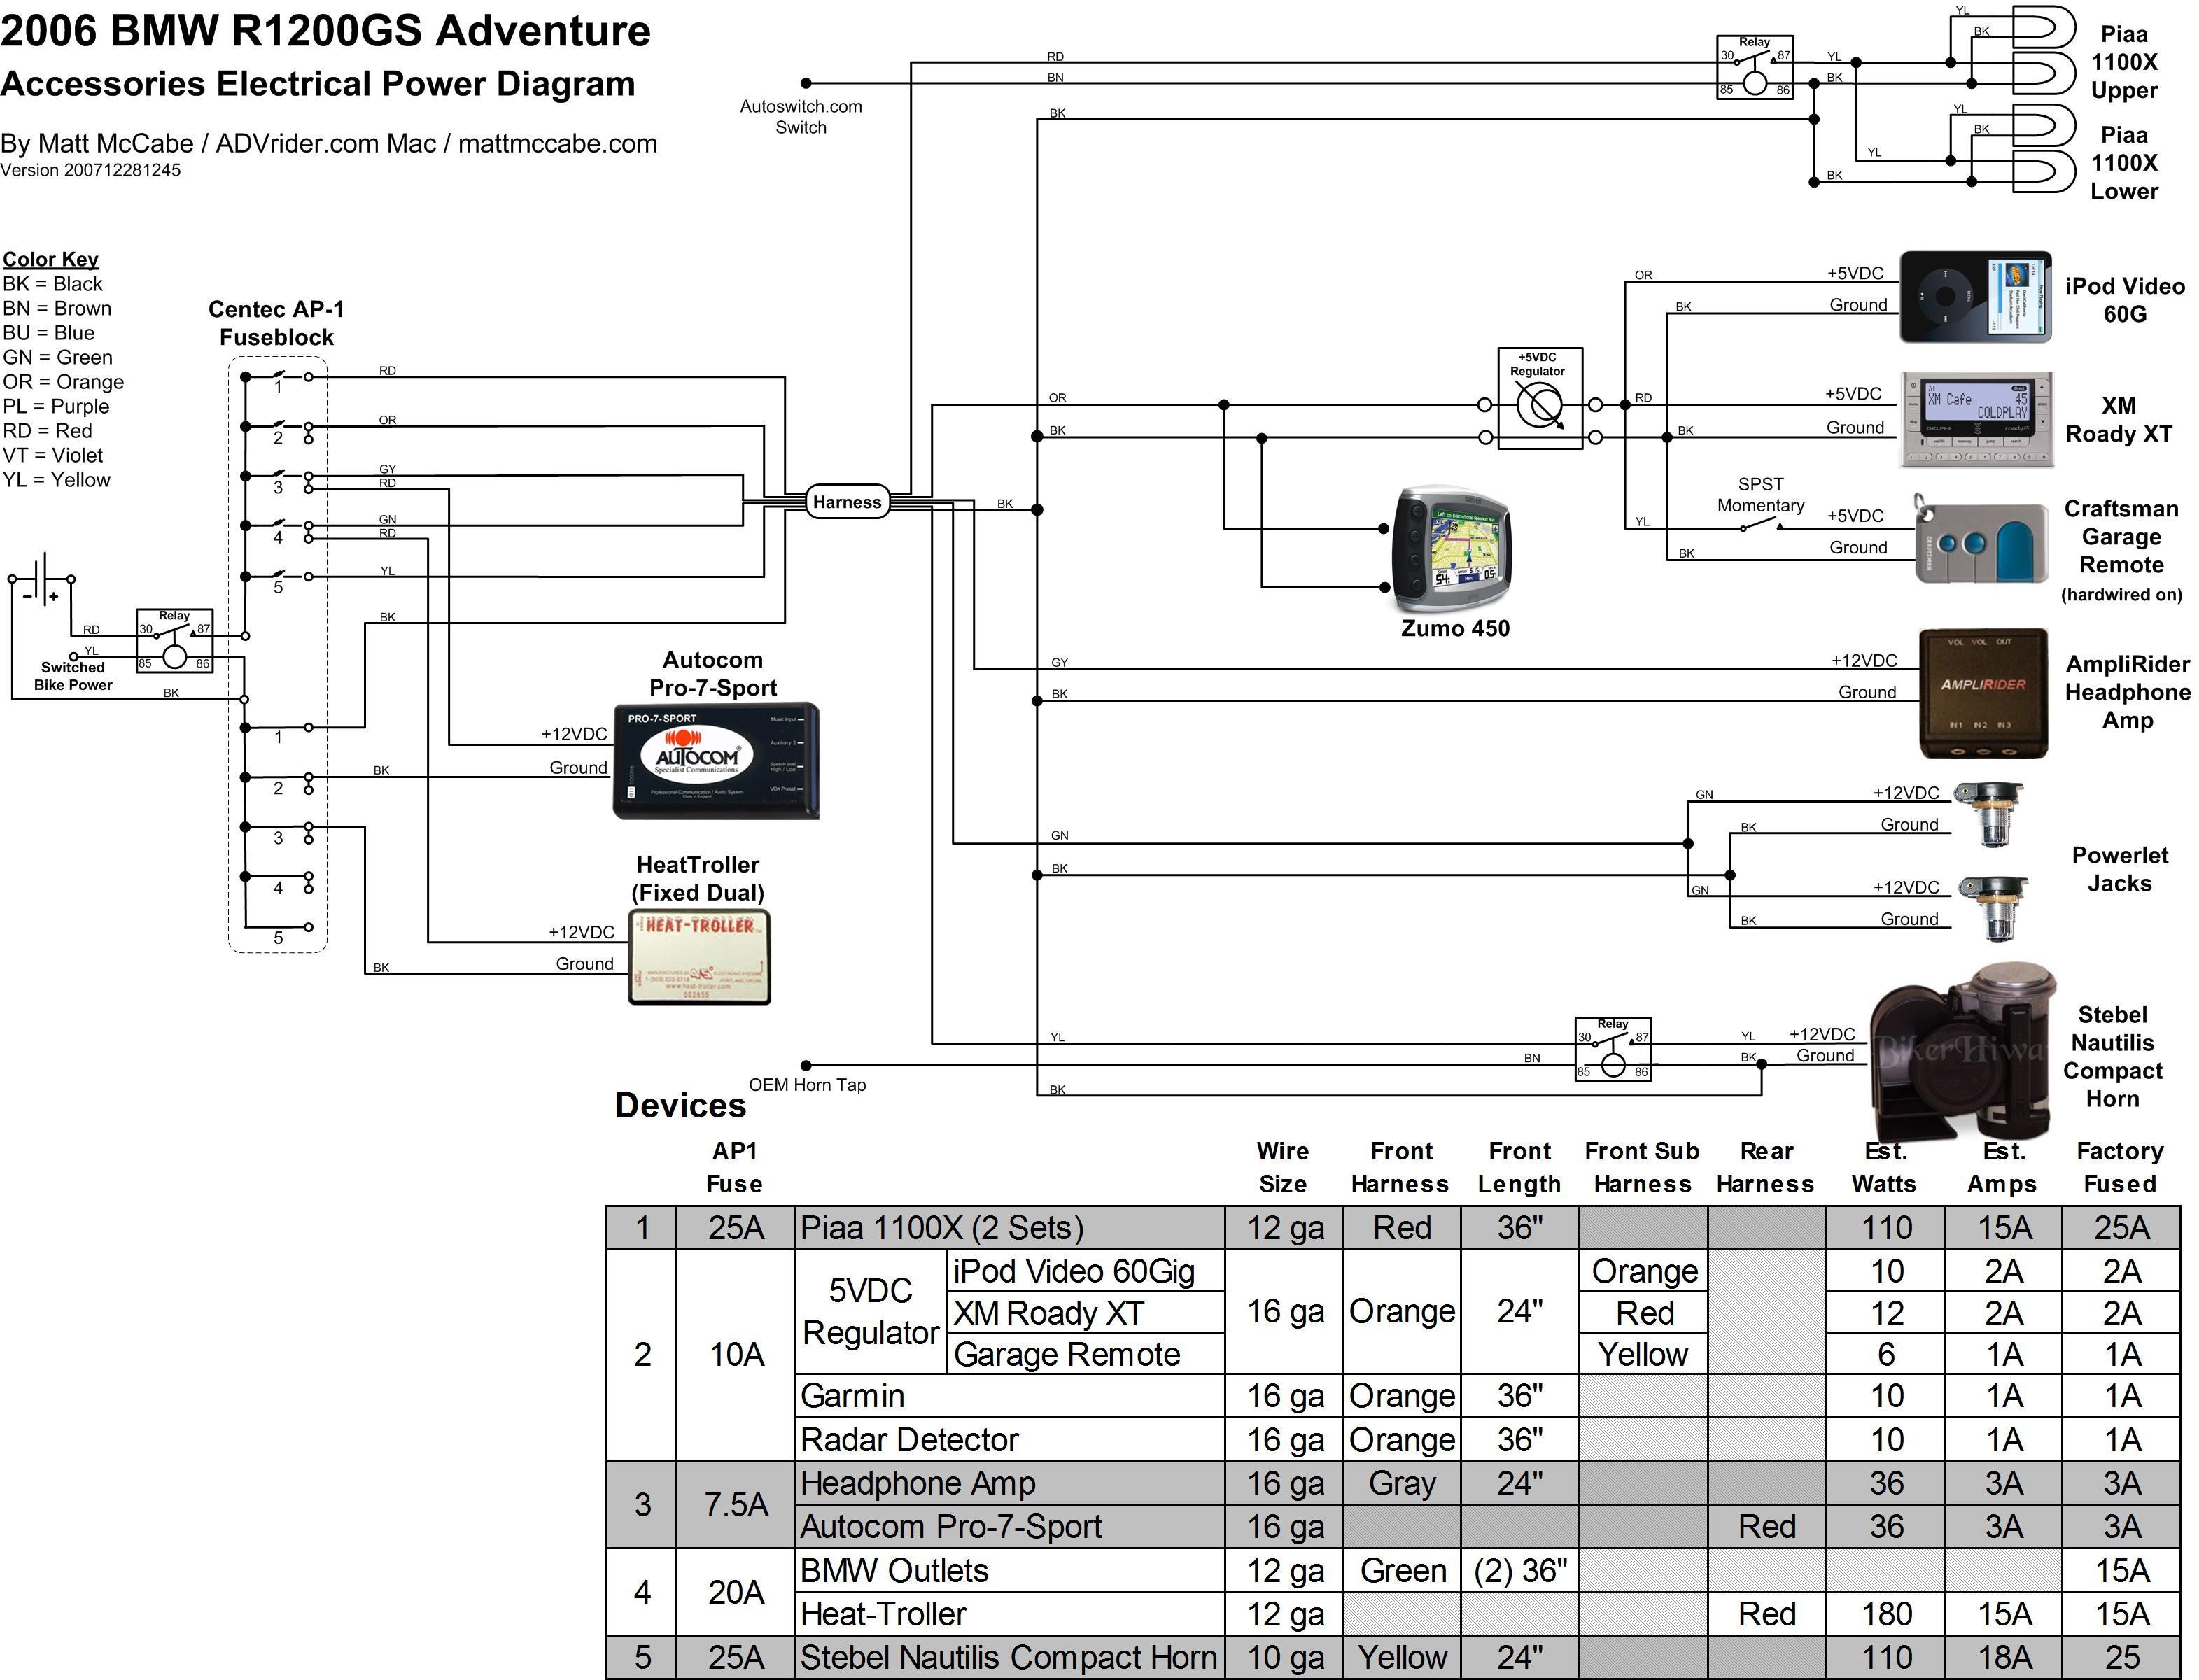 Garmin Transducer Wiring Diagram Garmin Wiring Diagram Blurts Of Garmin Transducer Wiring Diagram